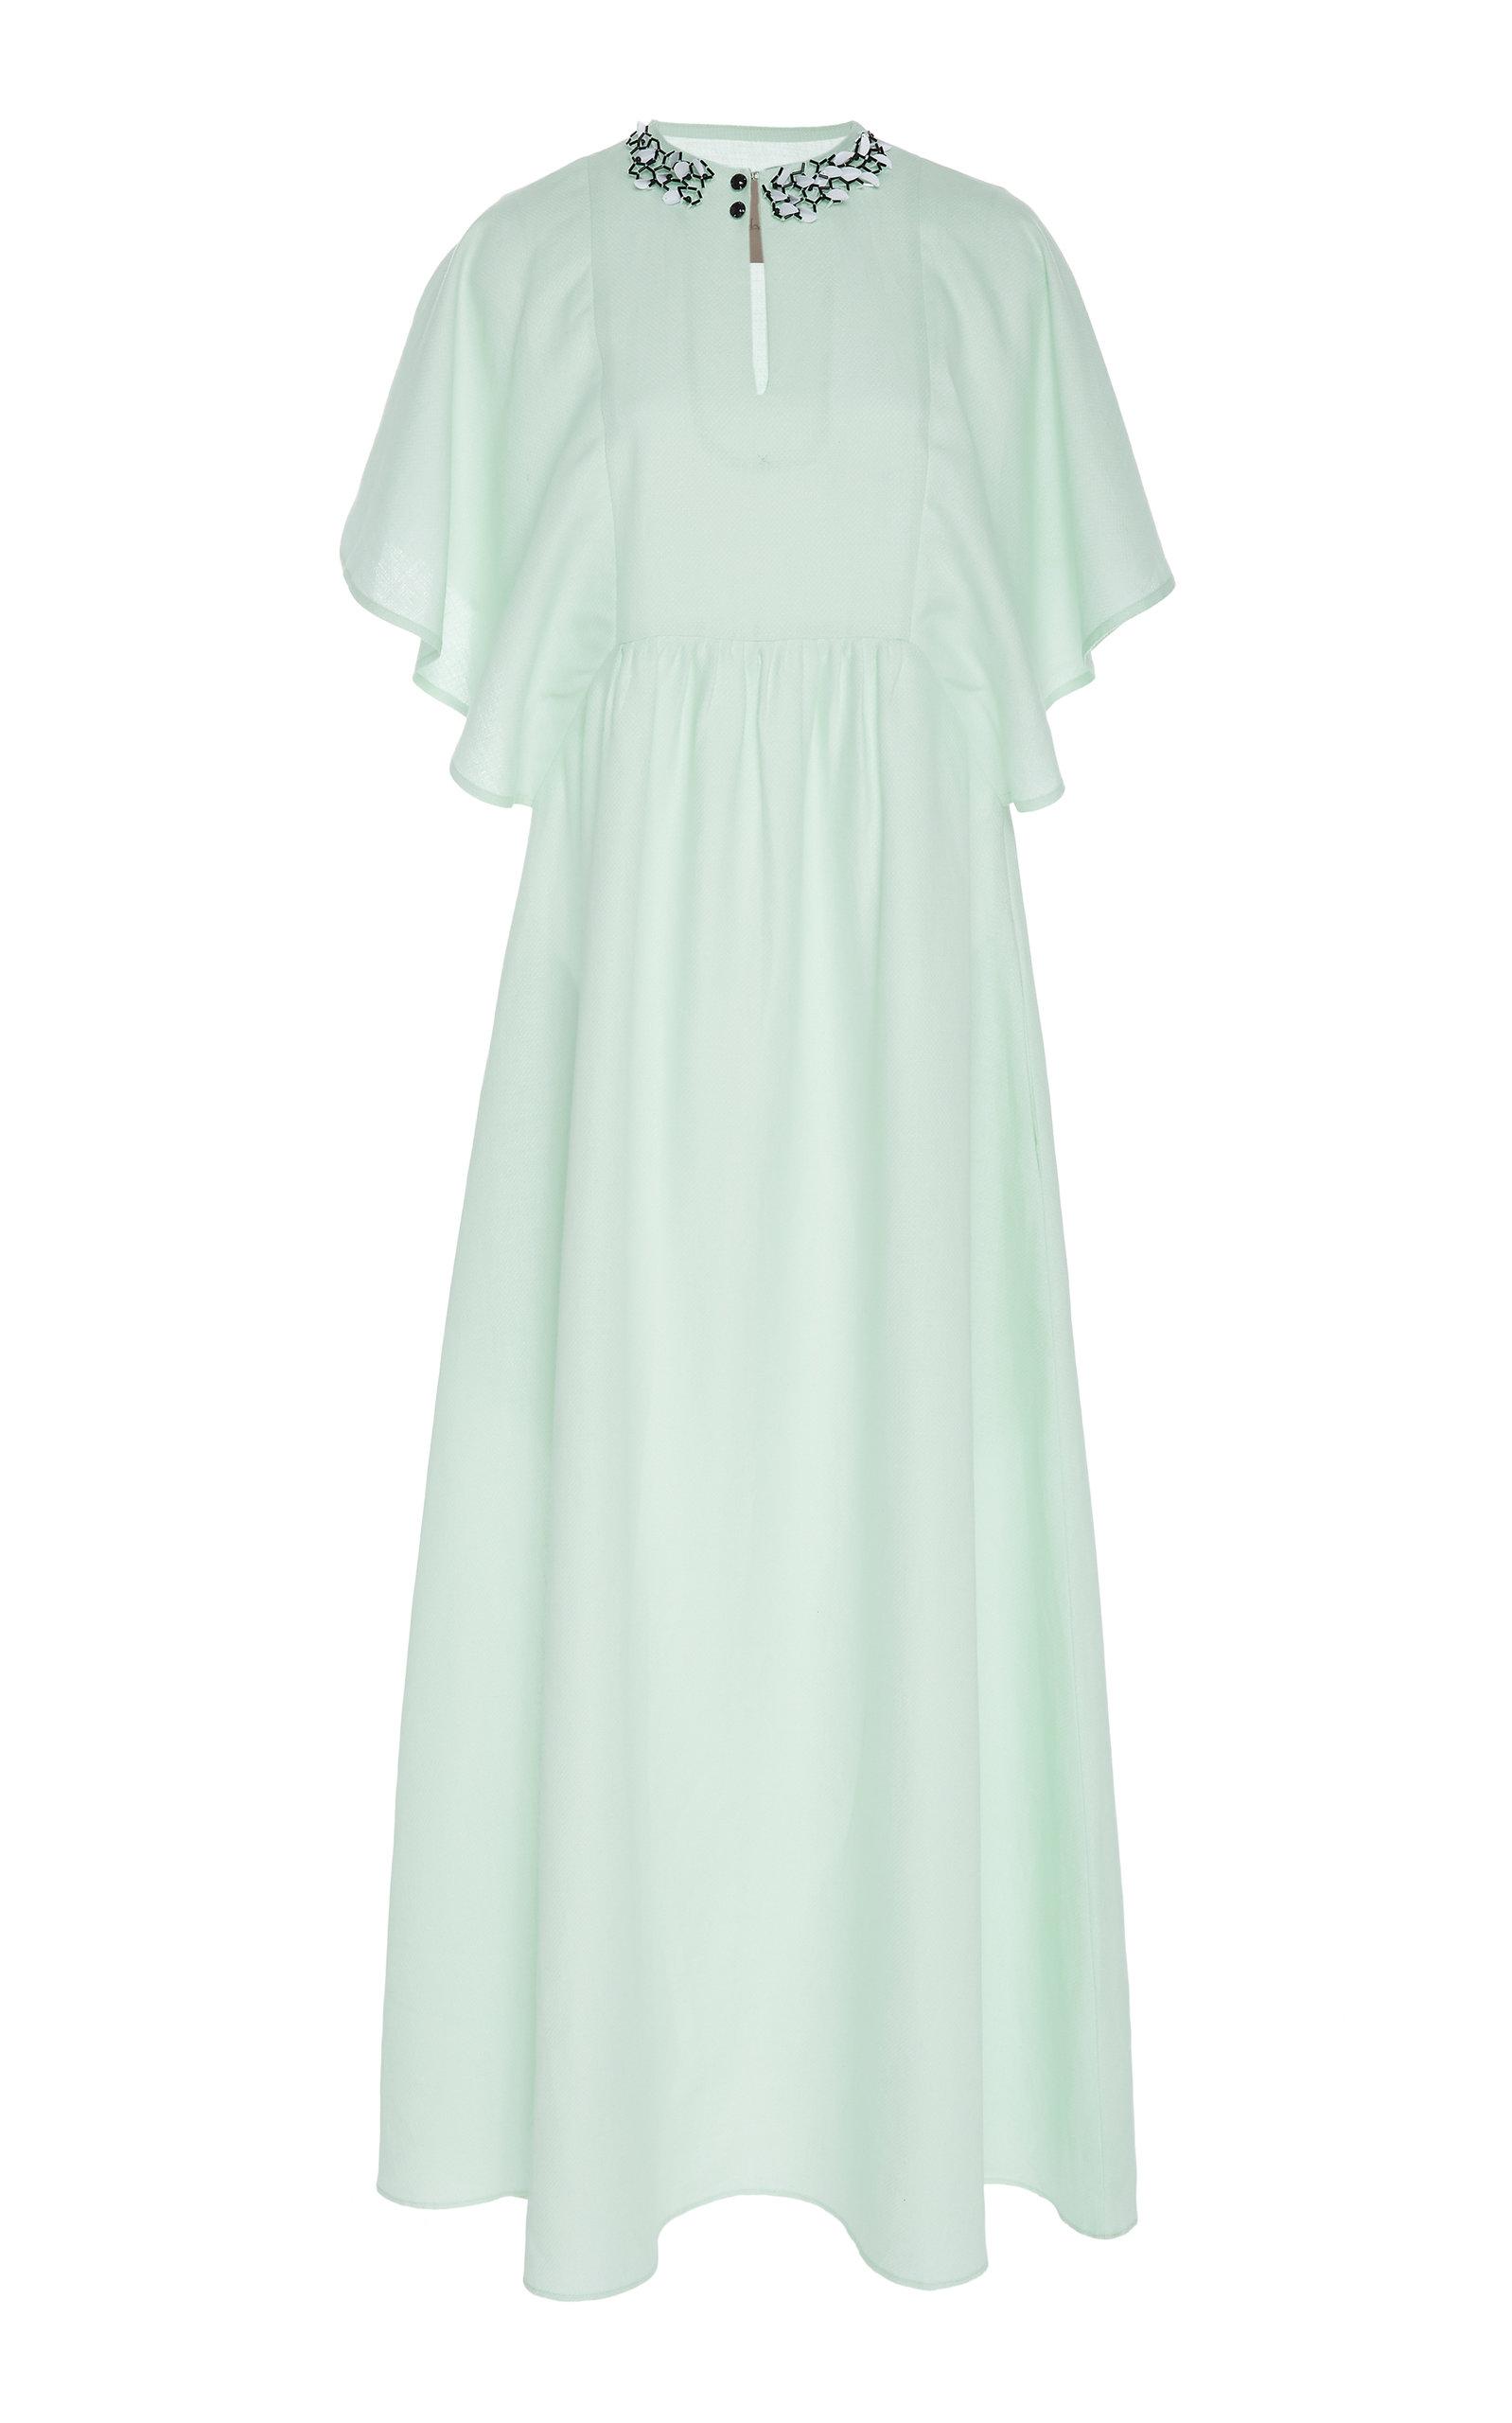 CHADOR Linen Marion A Maxi Dress in Green